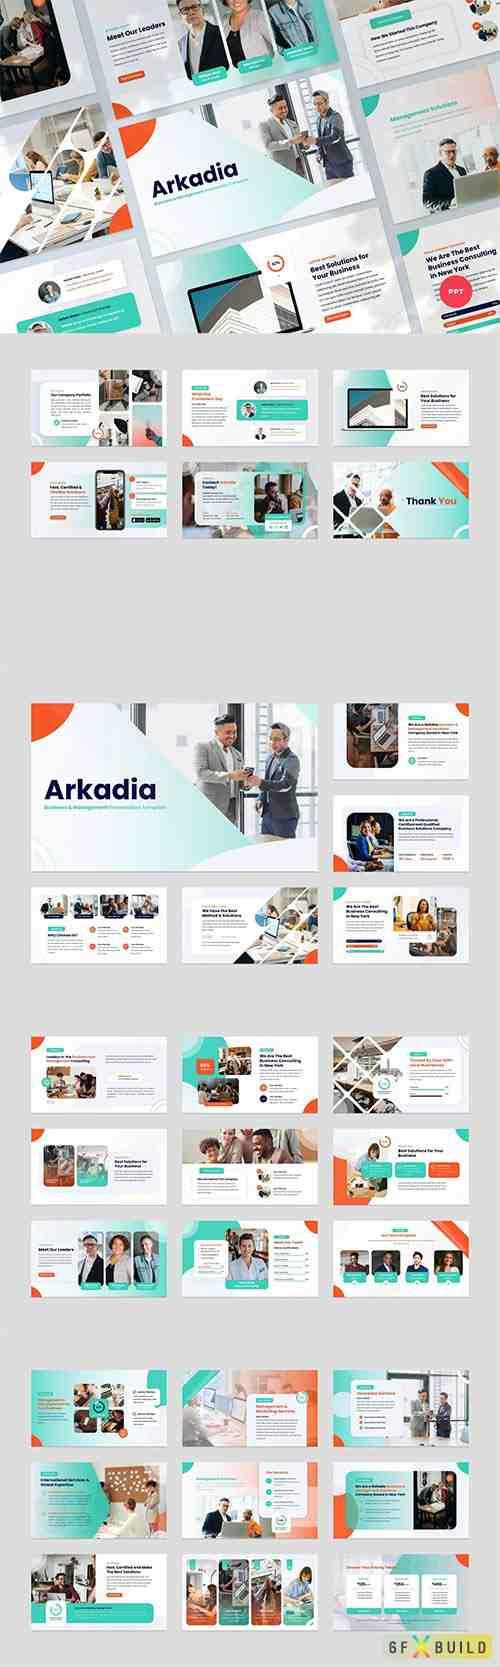 Business & Management PowerPoint Presentation